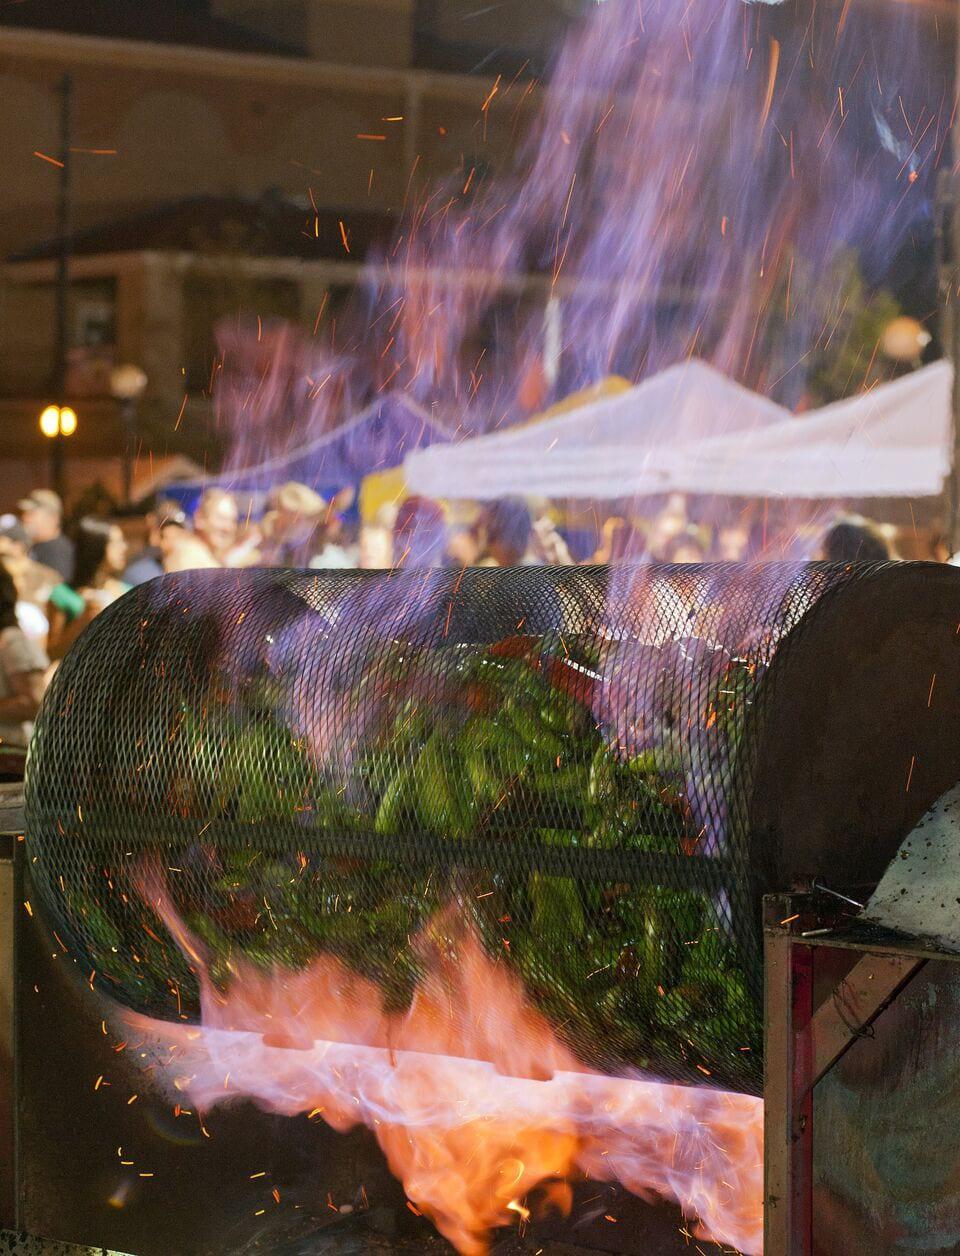 Chile Frijoles Festival Pueblo Fire Roasting Chiles